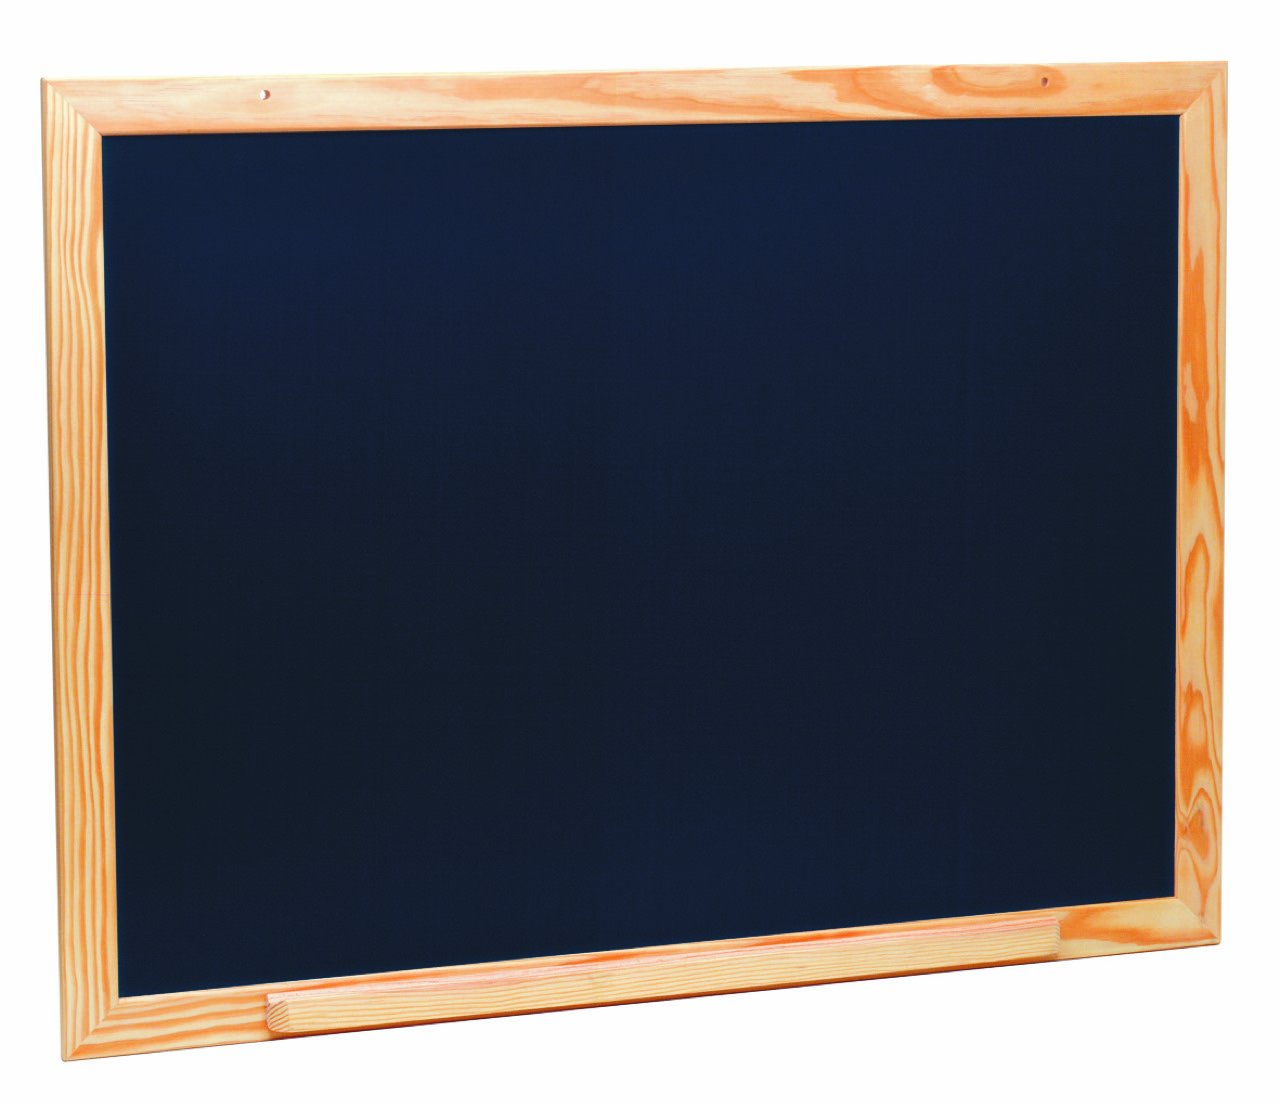 JeuJura 8780 - Pizarra Mural de madera, color negro grande, 88 x 66 cm